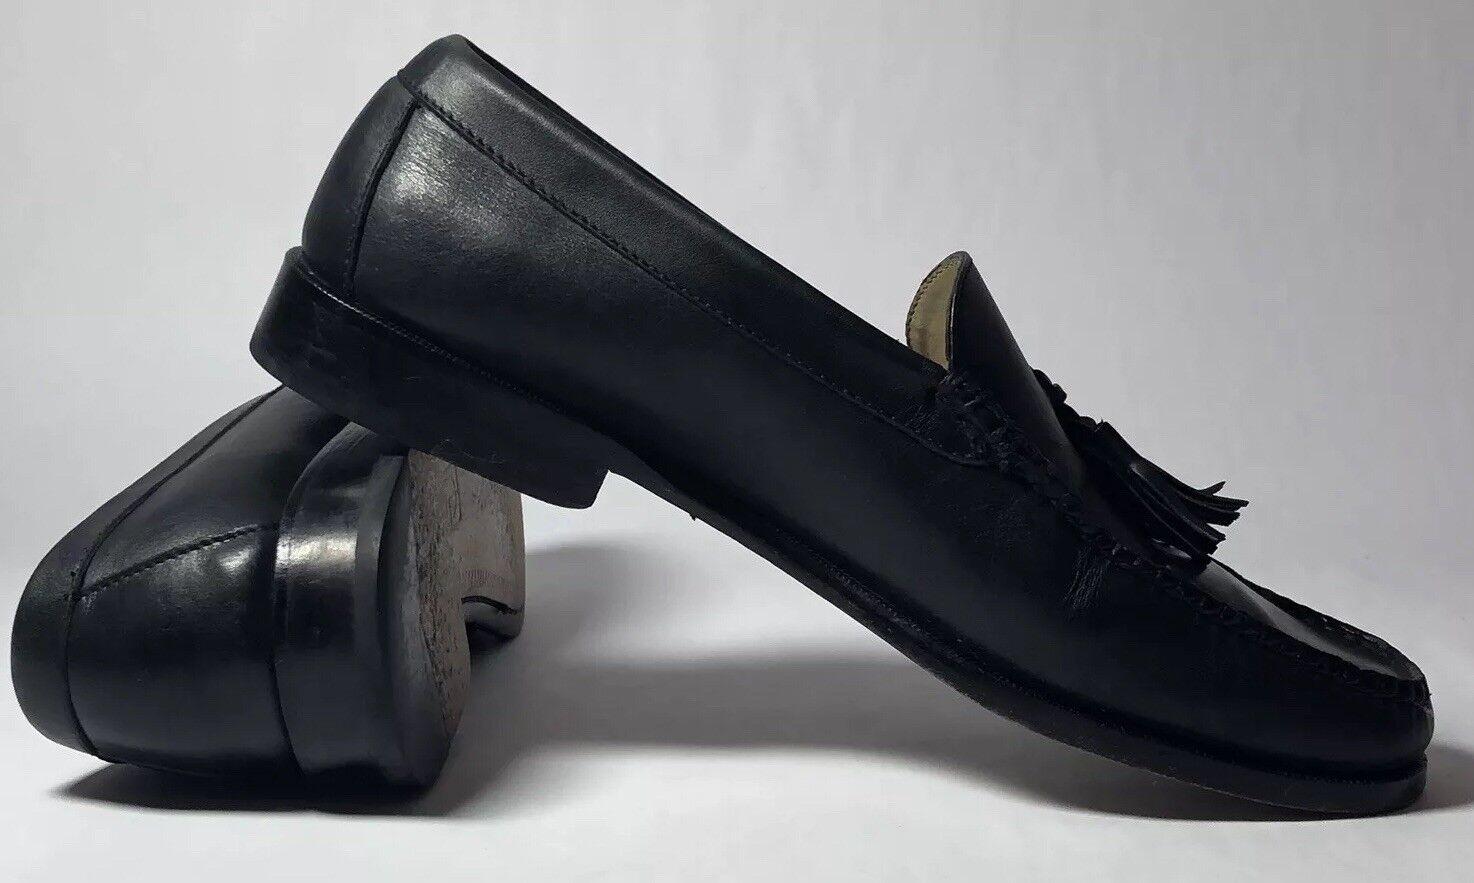 COLE HAAN Men's Black Leather Pinch Tassel Loafers 02573 Slip On Dress shoes 11 D